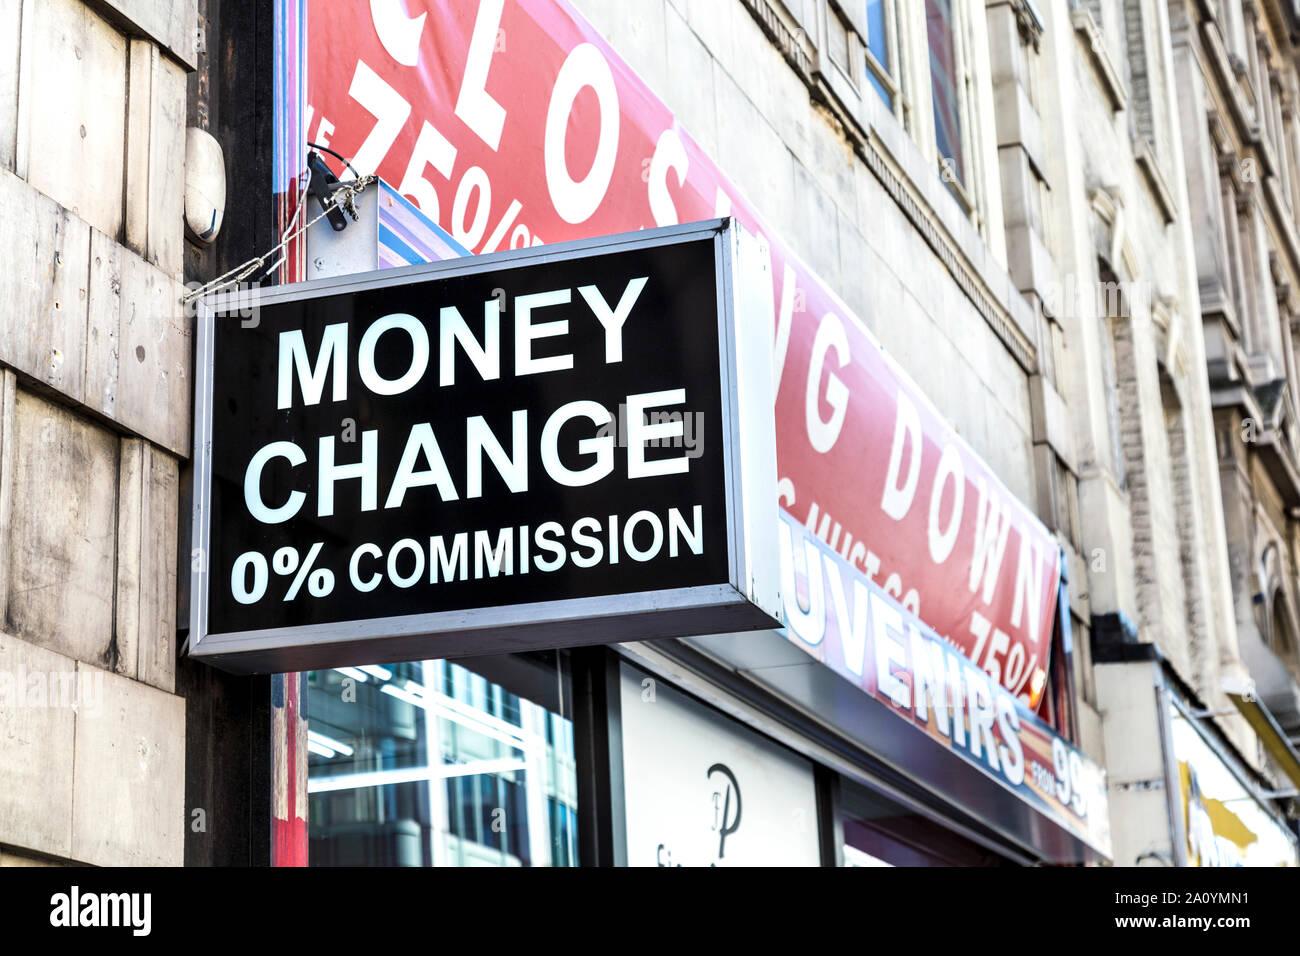 Bureau De Change Sign Saying Money Change 0 Commission London Uk Stock Photo Alamy